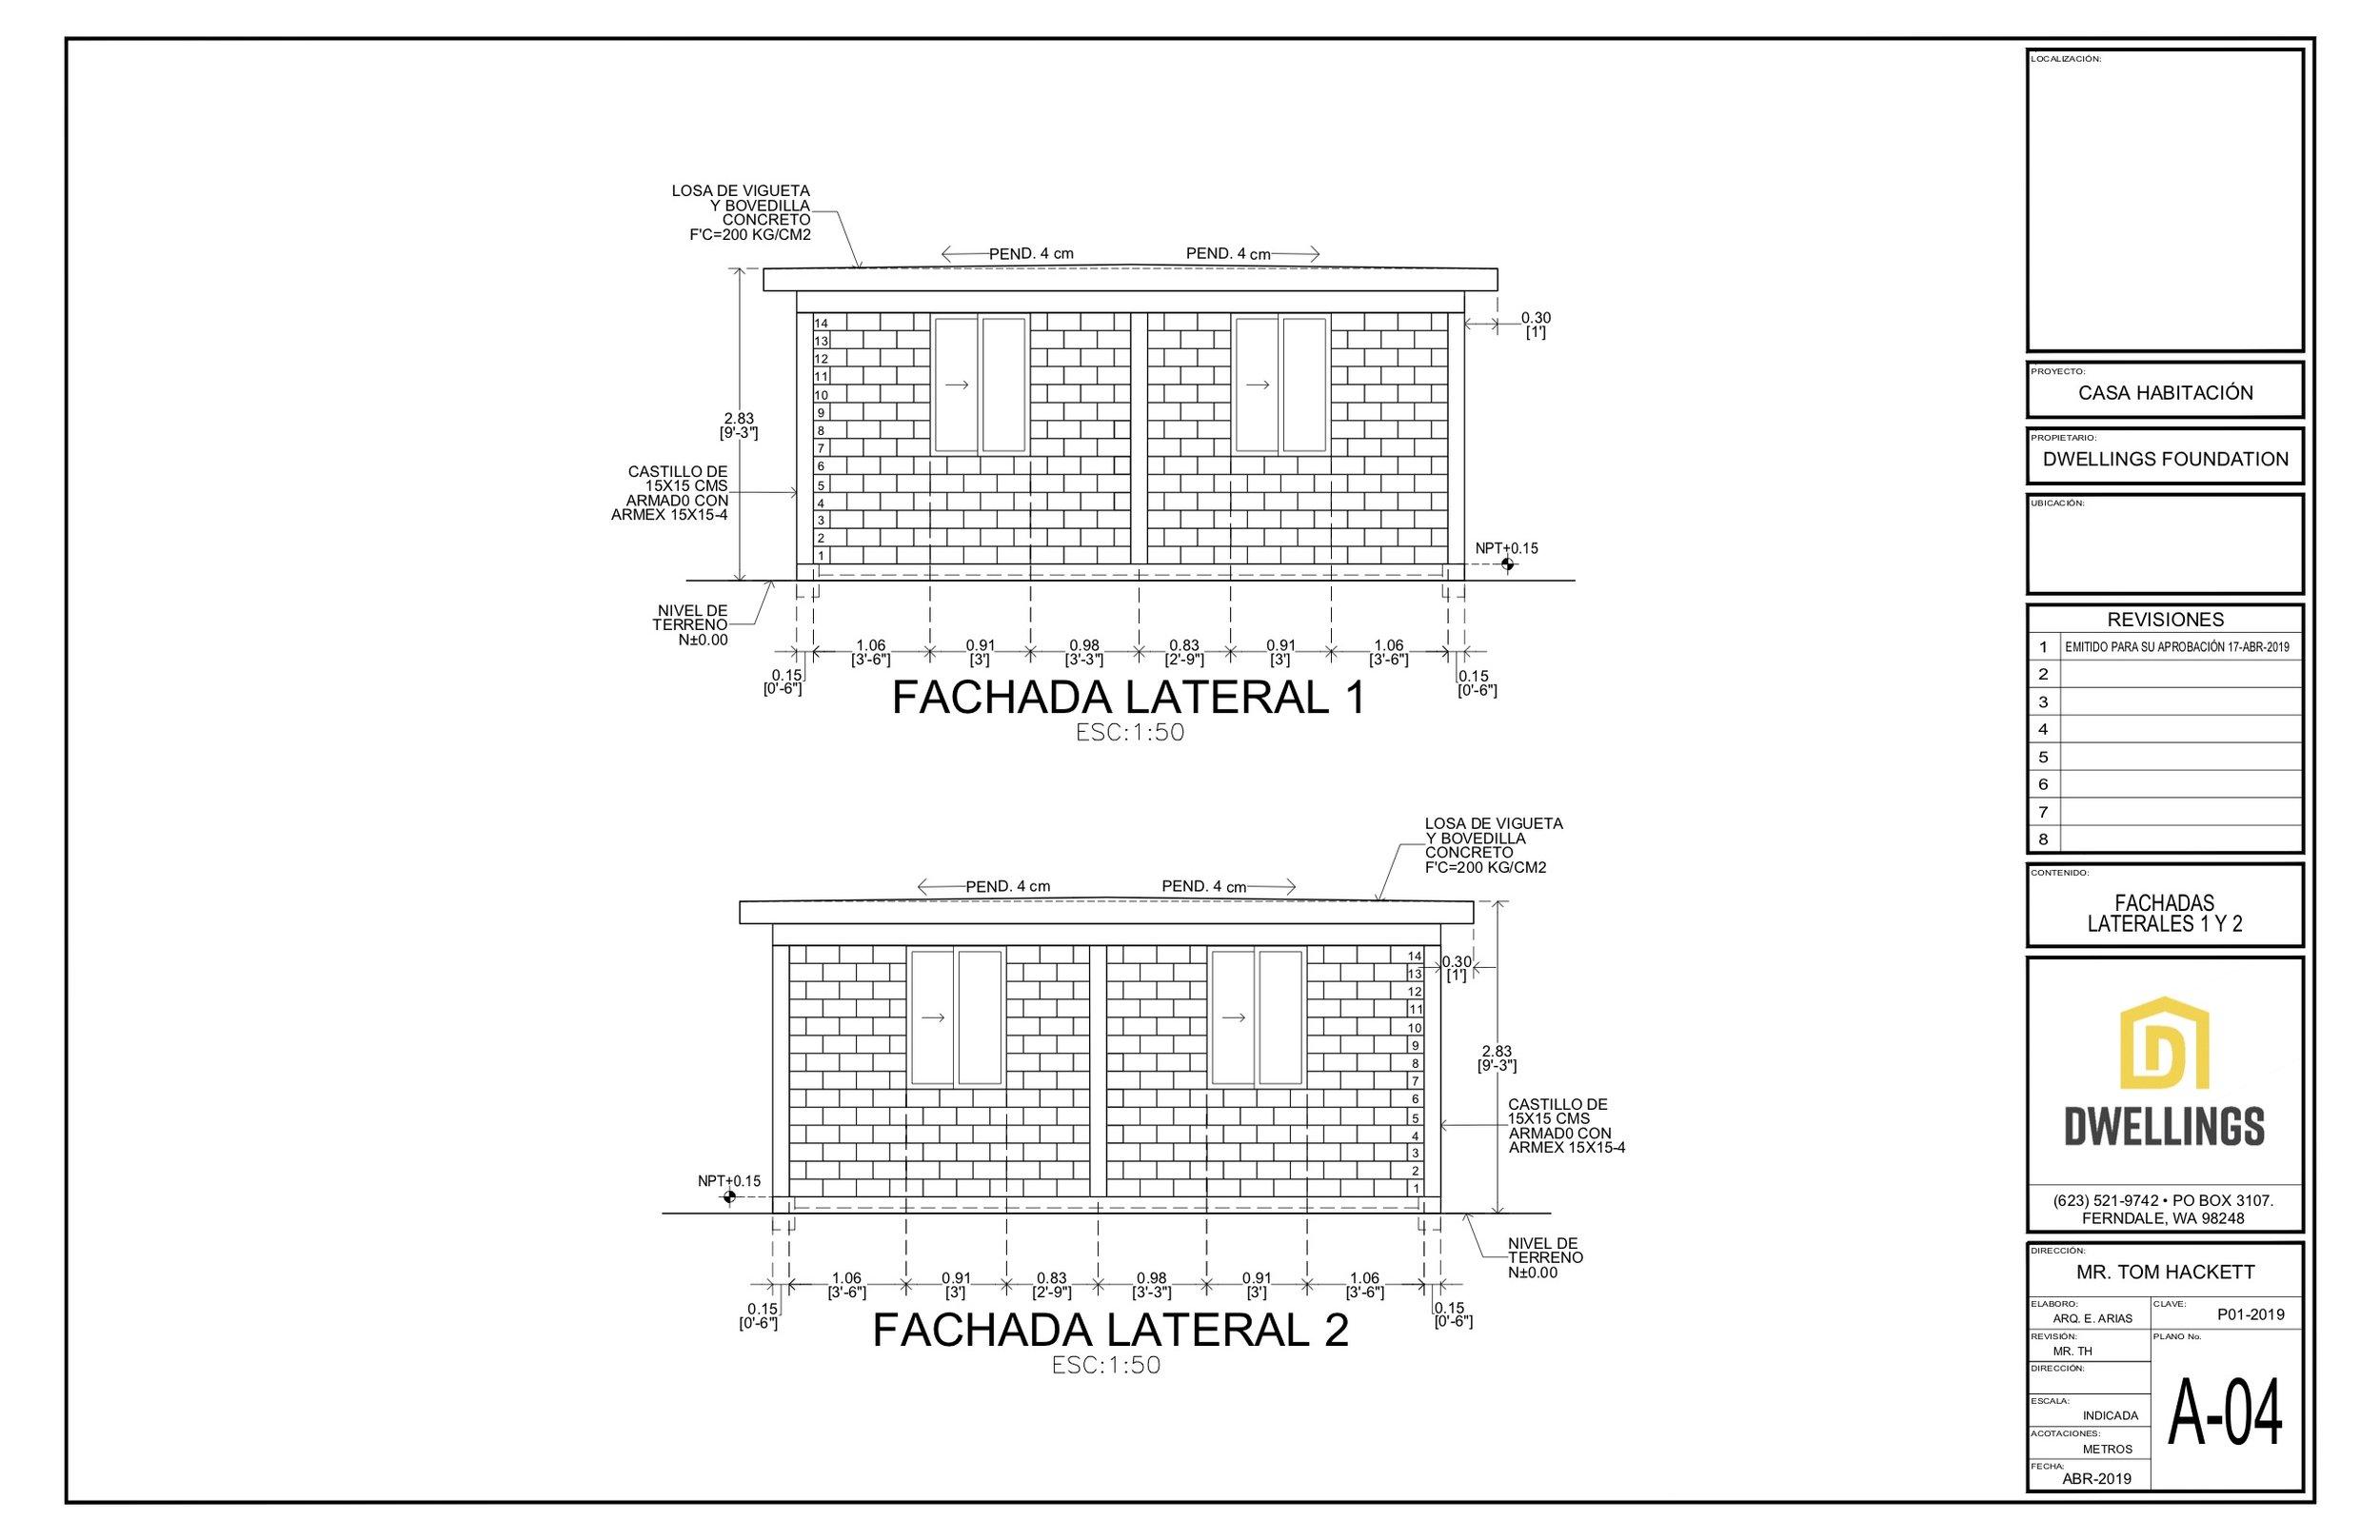 A-04 Fachadas Laterales 1 y 2.jpg